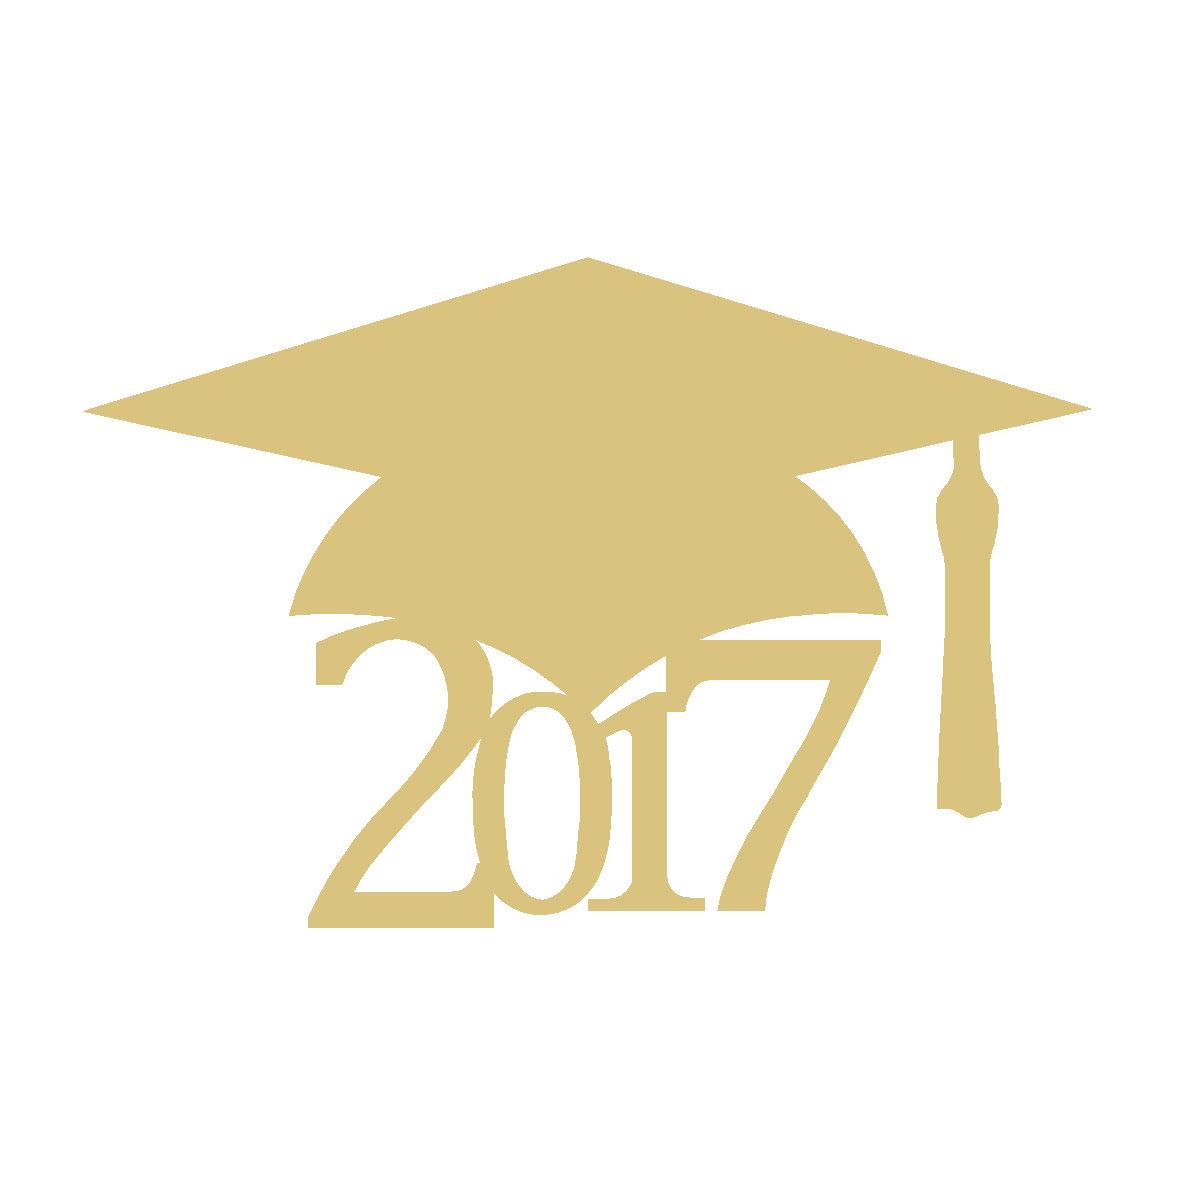 Graduation cap 2017 clipart svg freeuse download Graduation Cap 2017 Cutout Style 1 svg freeuse download